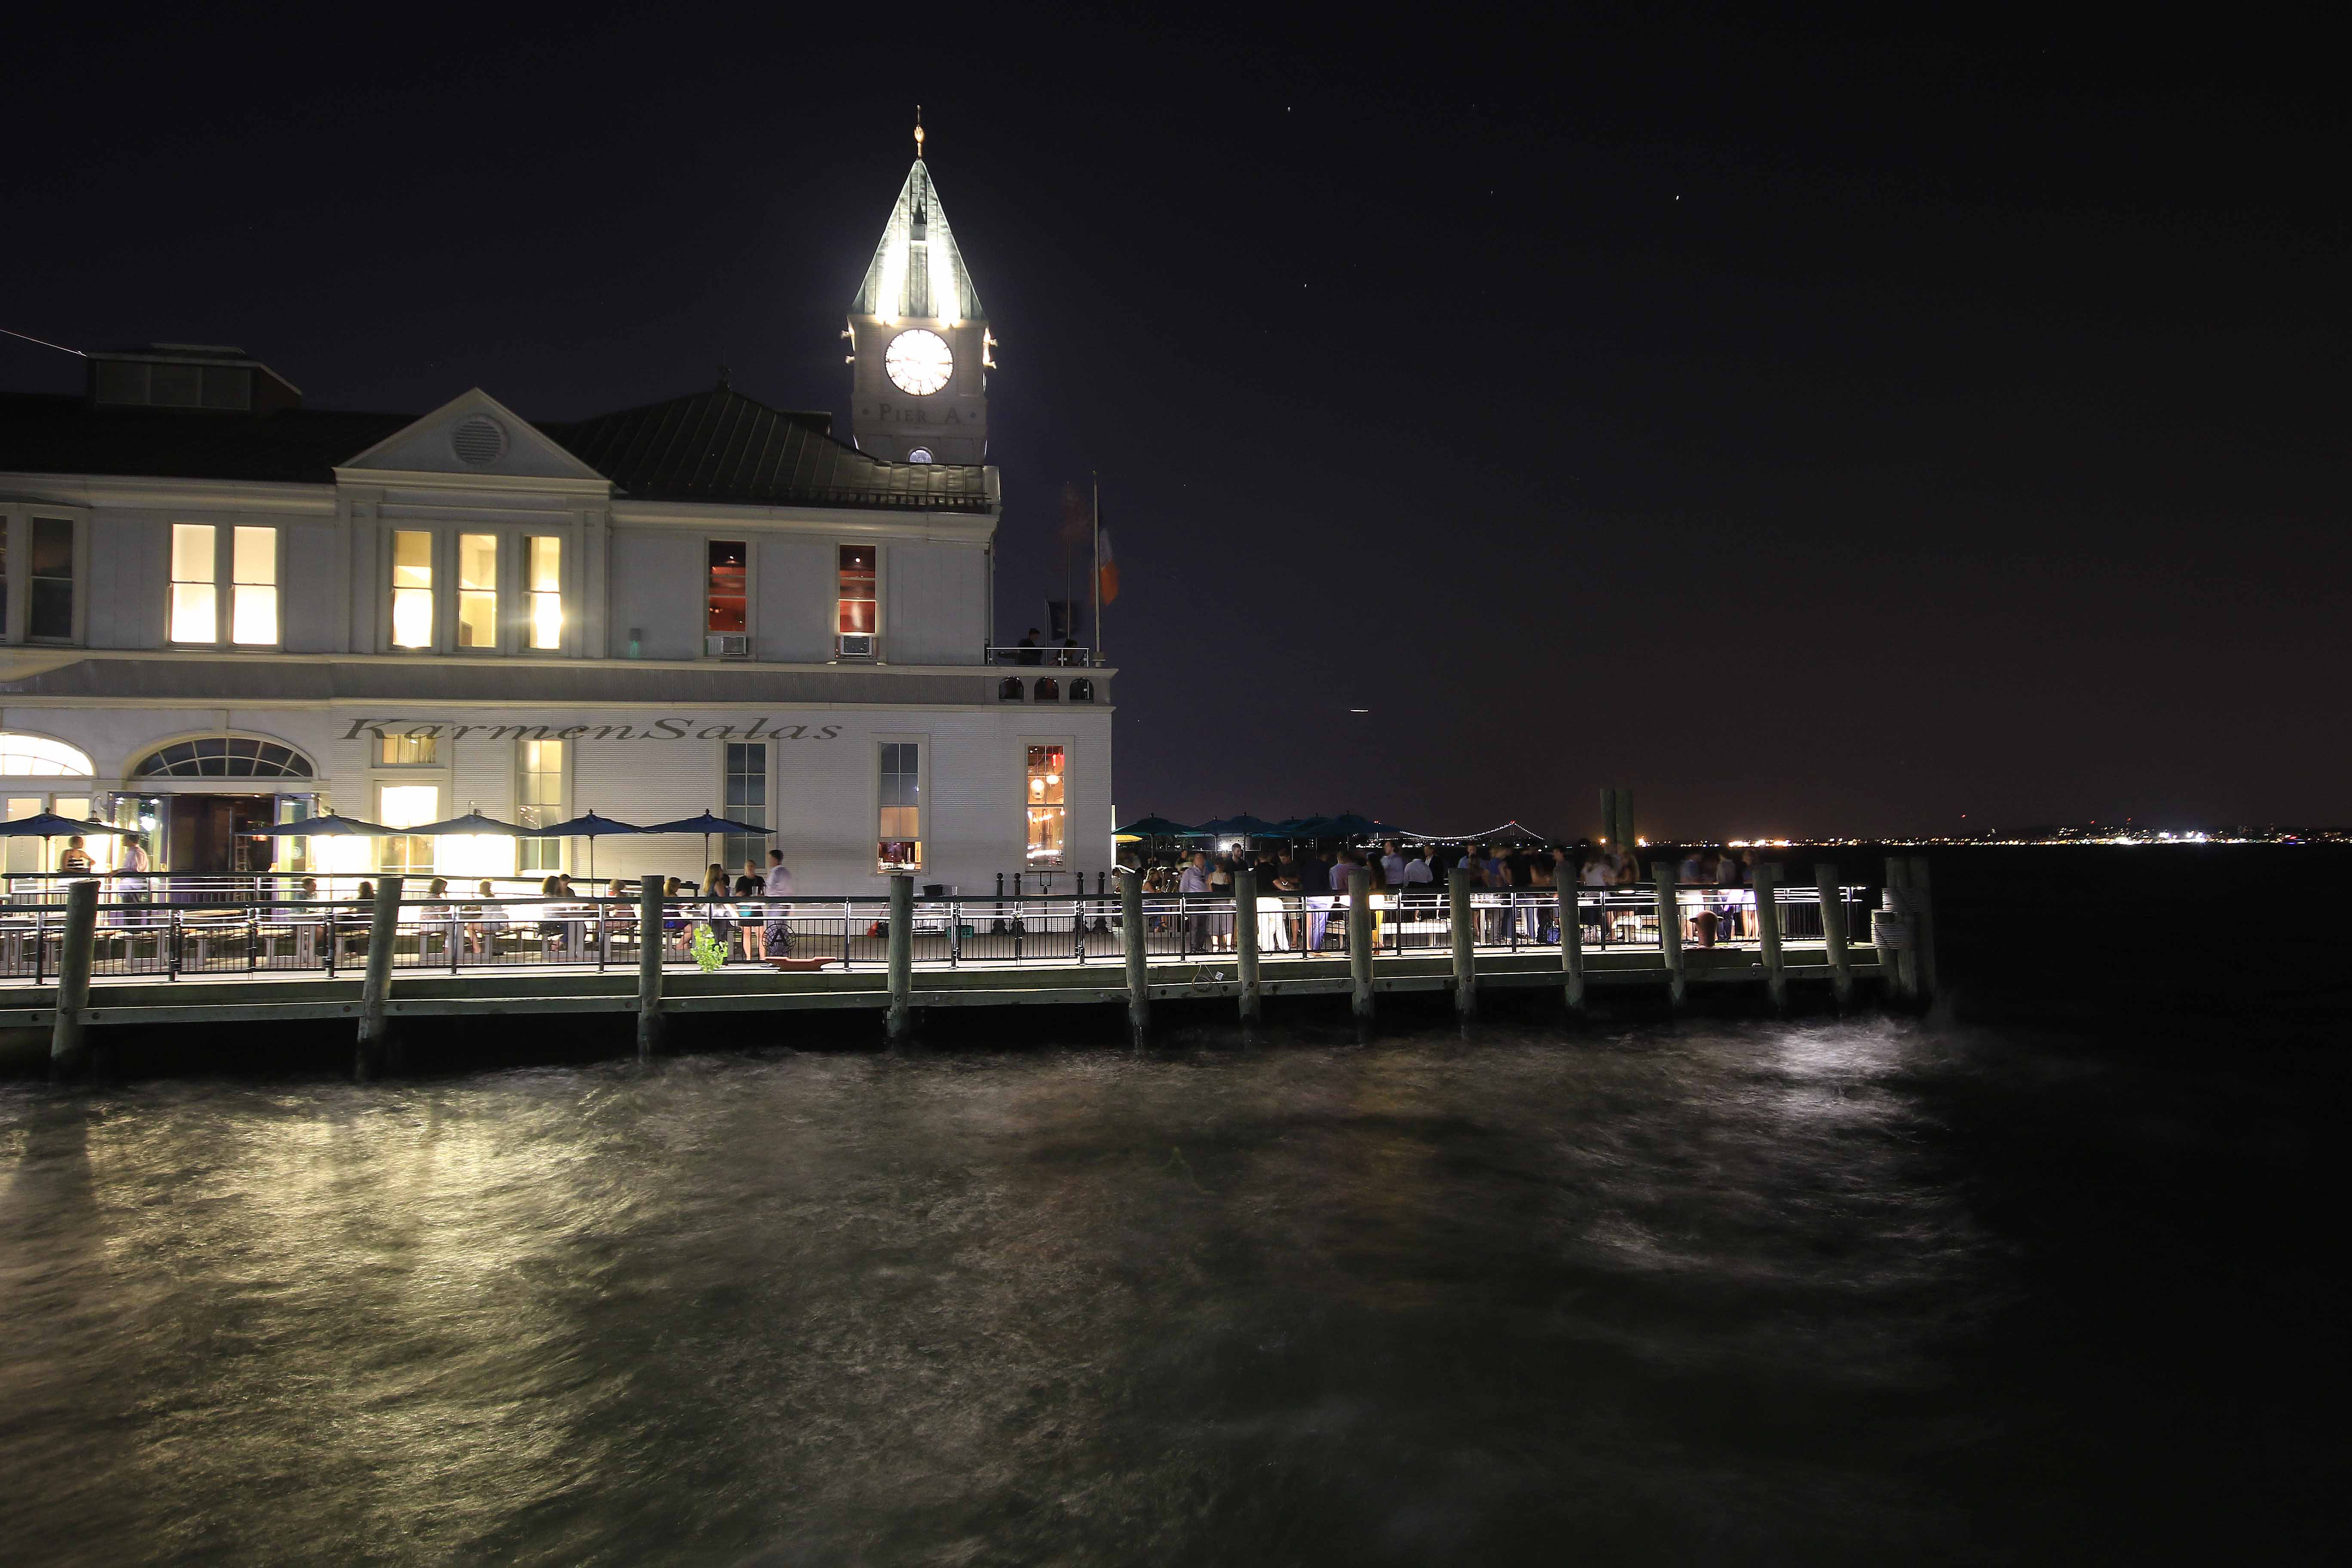 Embarcadero de Battery Park